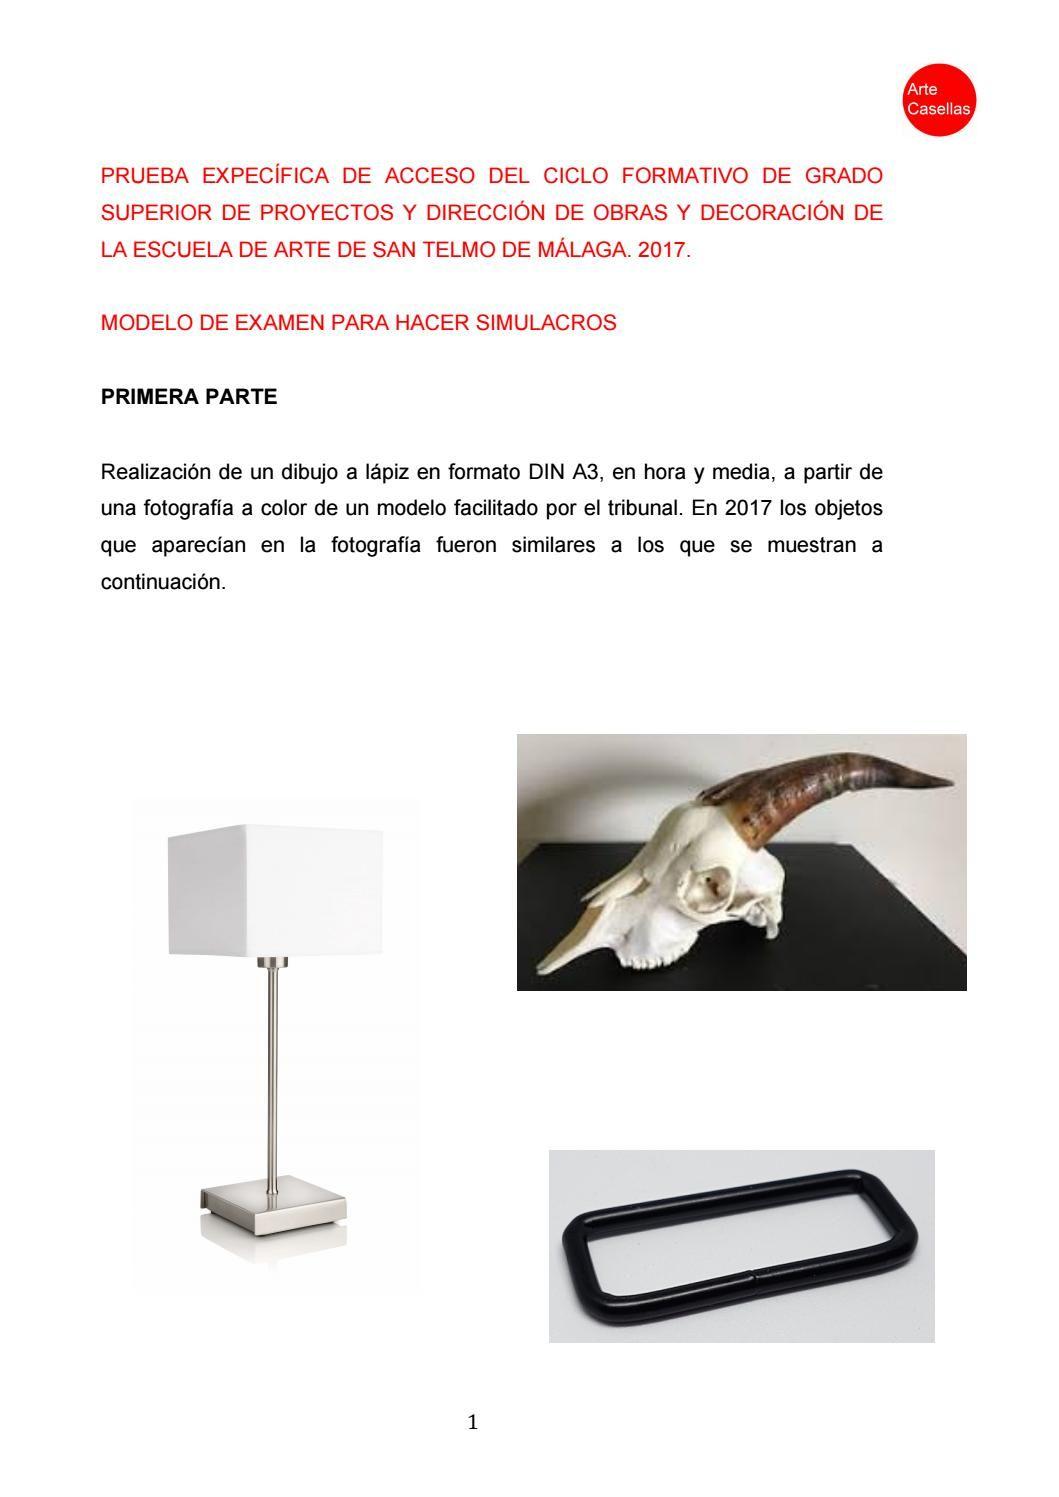 Modelo Prueba Específica 2017 Grado Superior Interiores Málaga Clases Preparación Online Modelo De Examen Preparación Azulejos De Metro